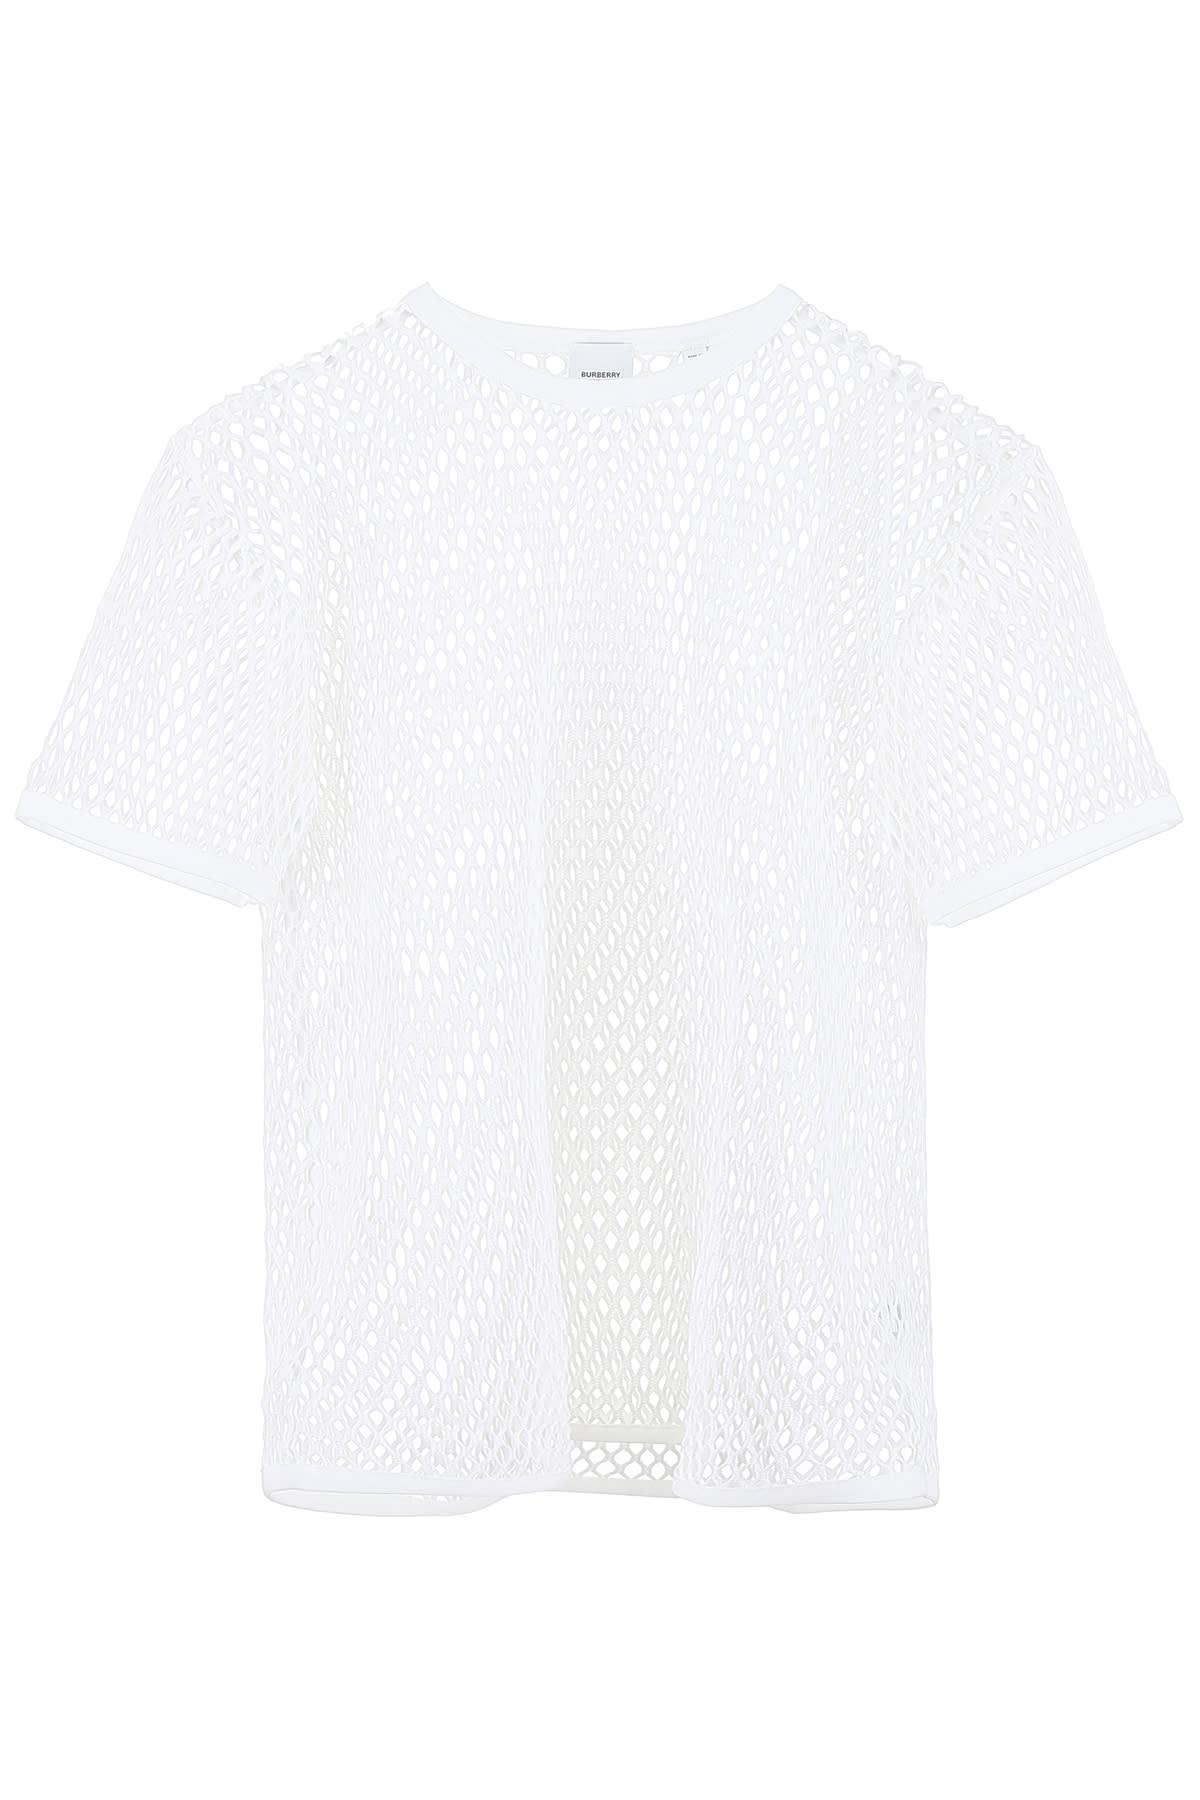 e3875aae4 Buy burberry t-shirts & tanks for men - Best men's burberry t-shirts ...